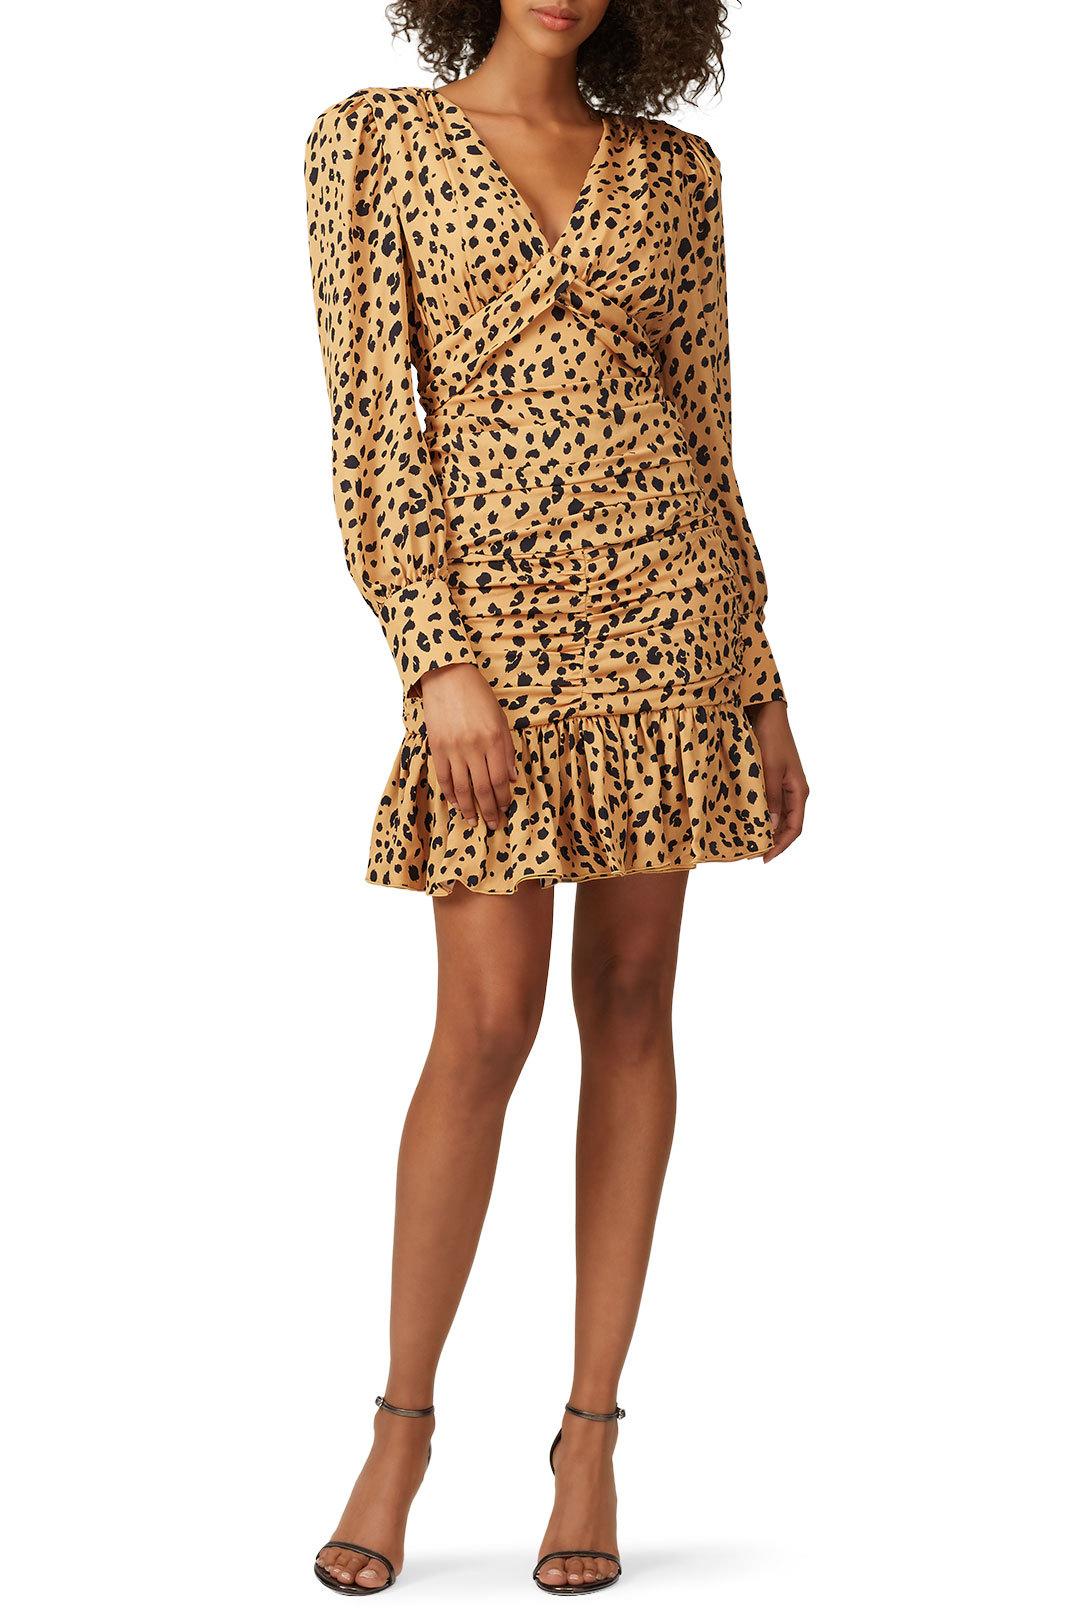 Nicholas - Leopard Gathered Frill Dress